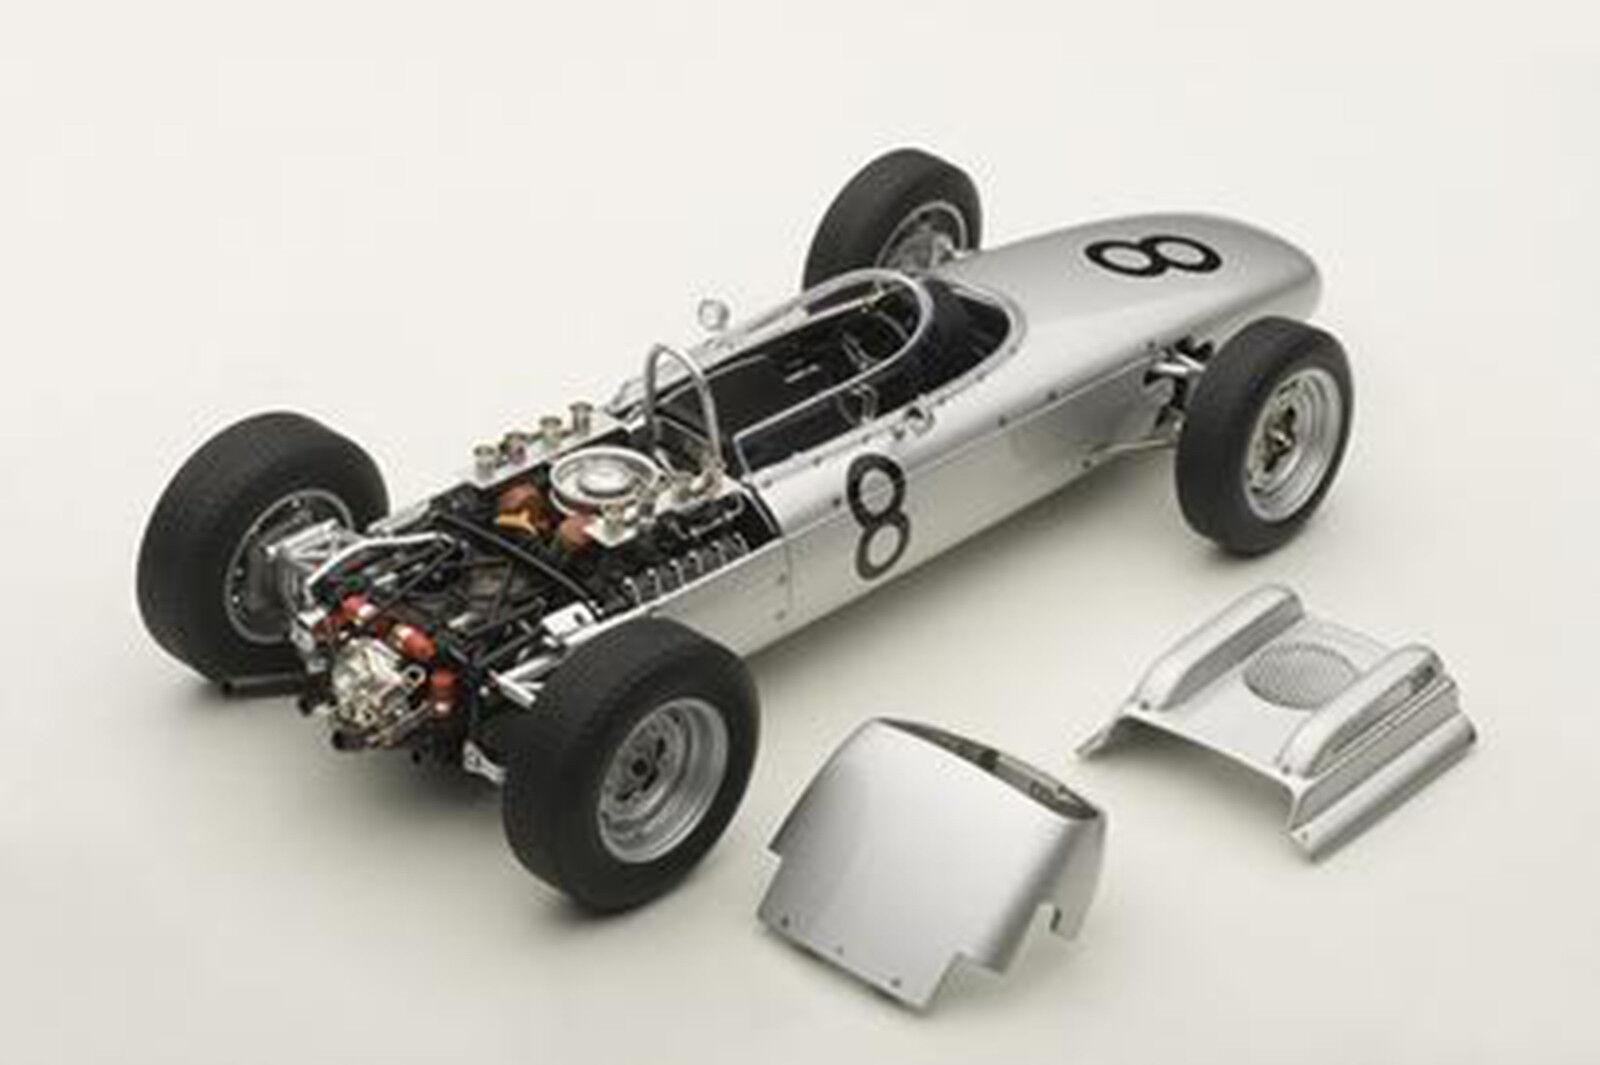 Autoart Porsche 804 F1 1962 Nürburgring Bonnier  8 1 18 Maßstab Neu  Im Lager  | Zuverlässiger Ruf